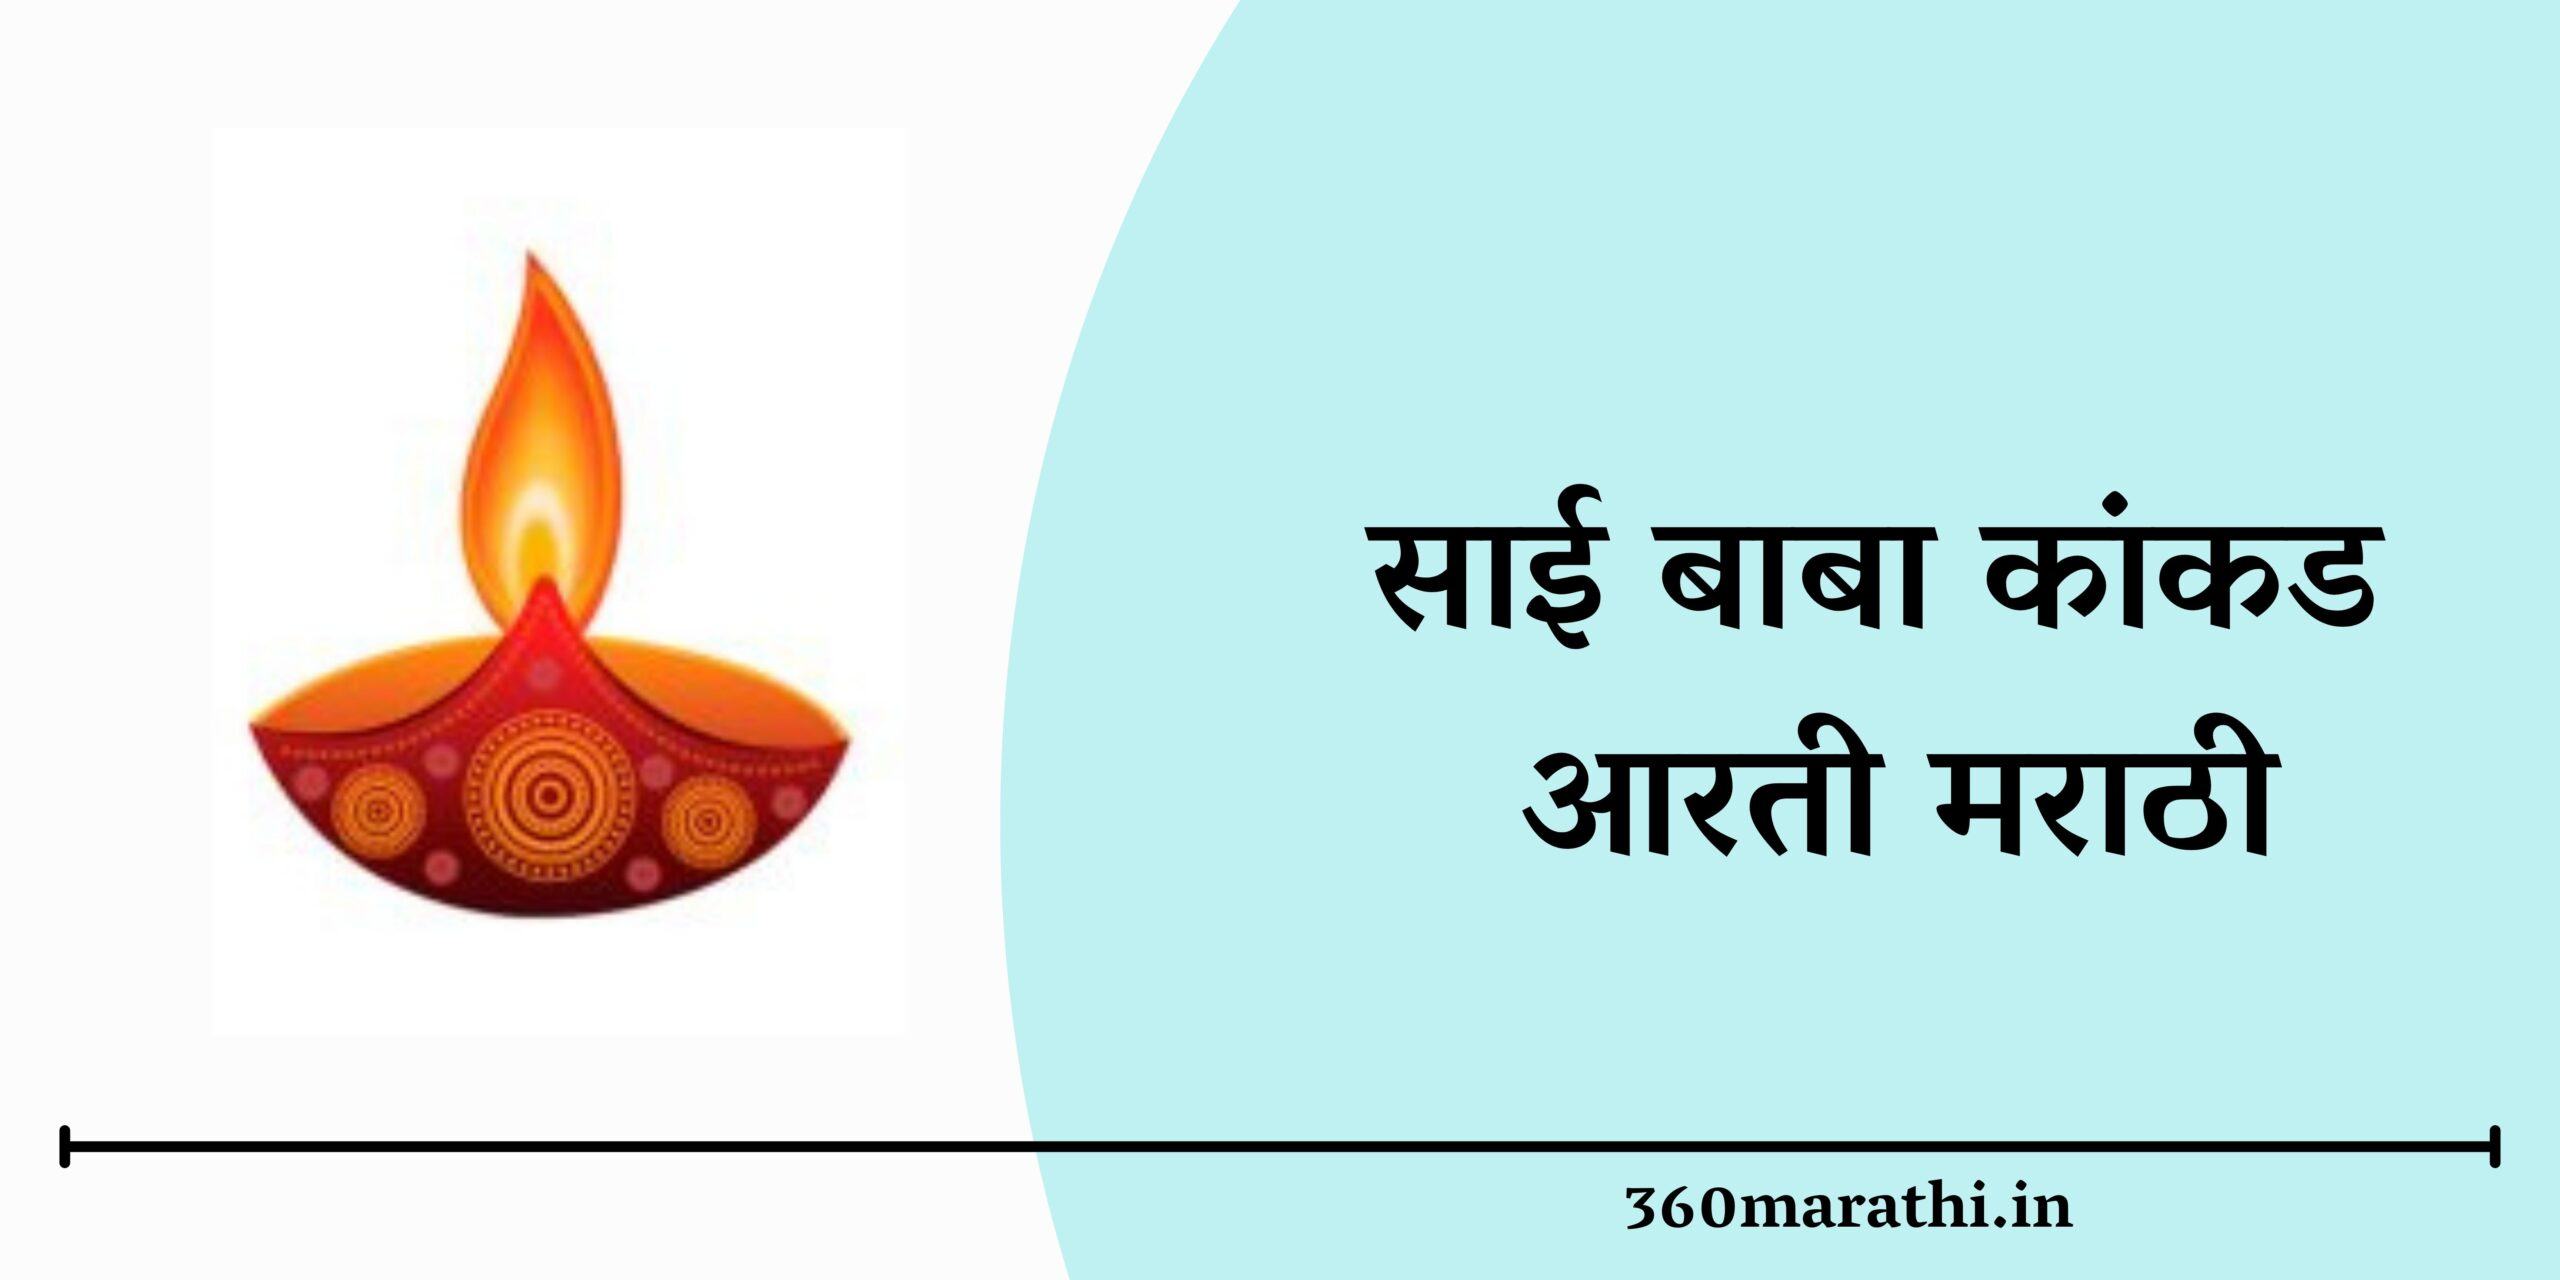 (PDF/MP3)साई बाबा कांकड आरती मराठी Lyrics   Sai Baba Kakad Aarti Marathi Lyrics   Kakad Aarti Mp3 Download